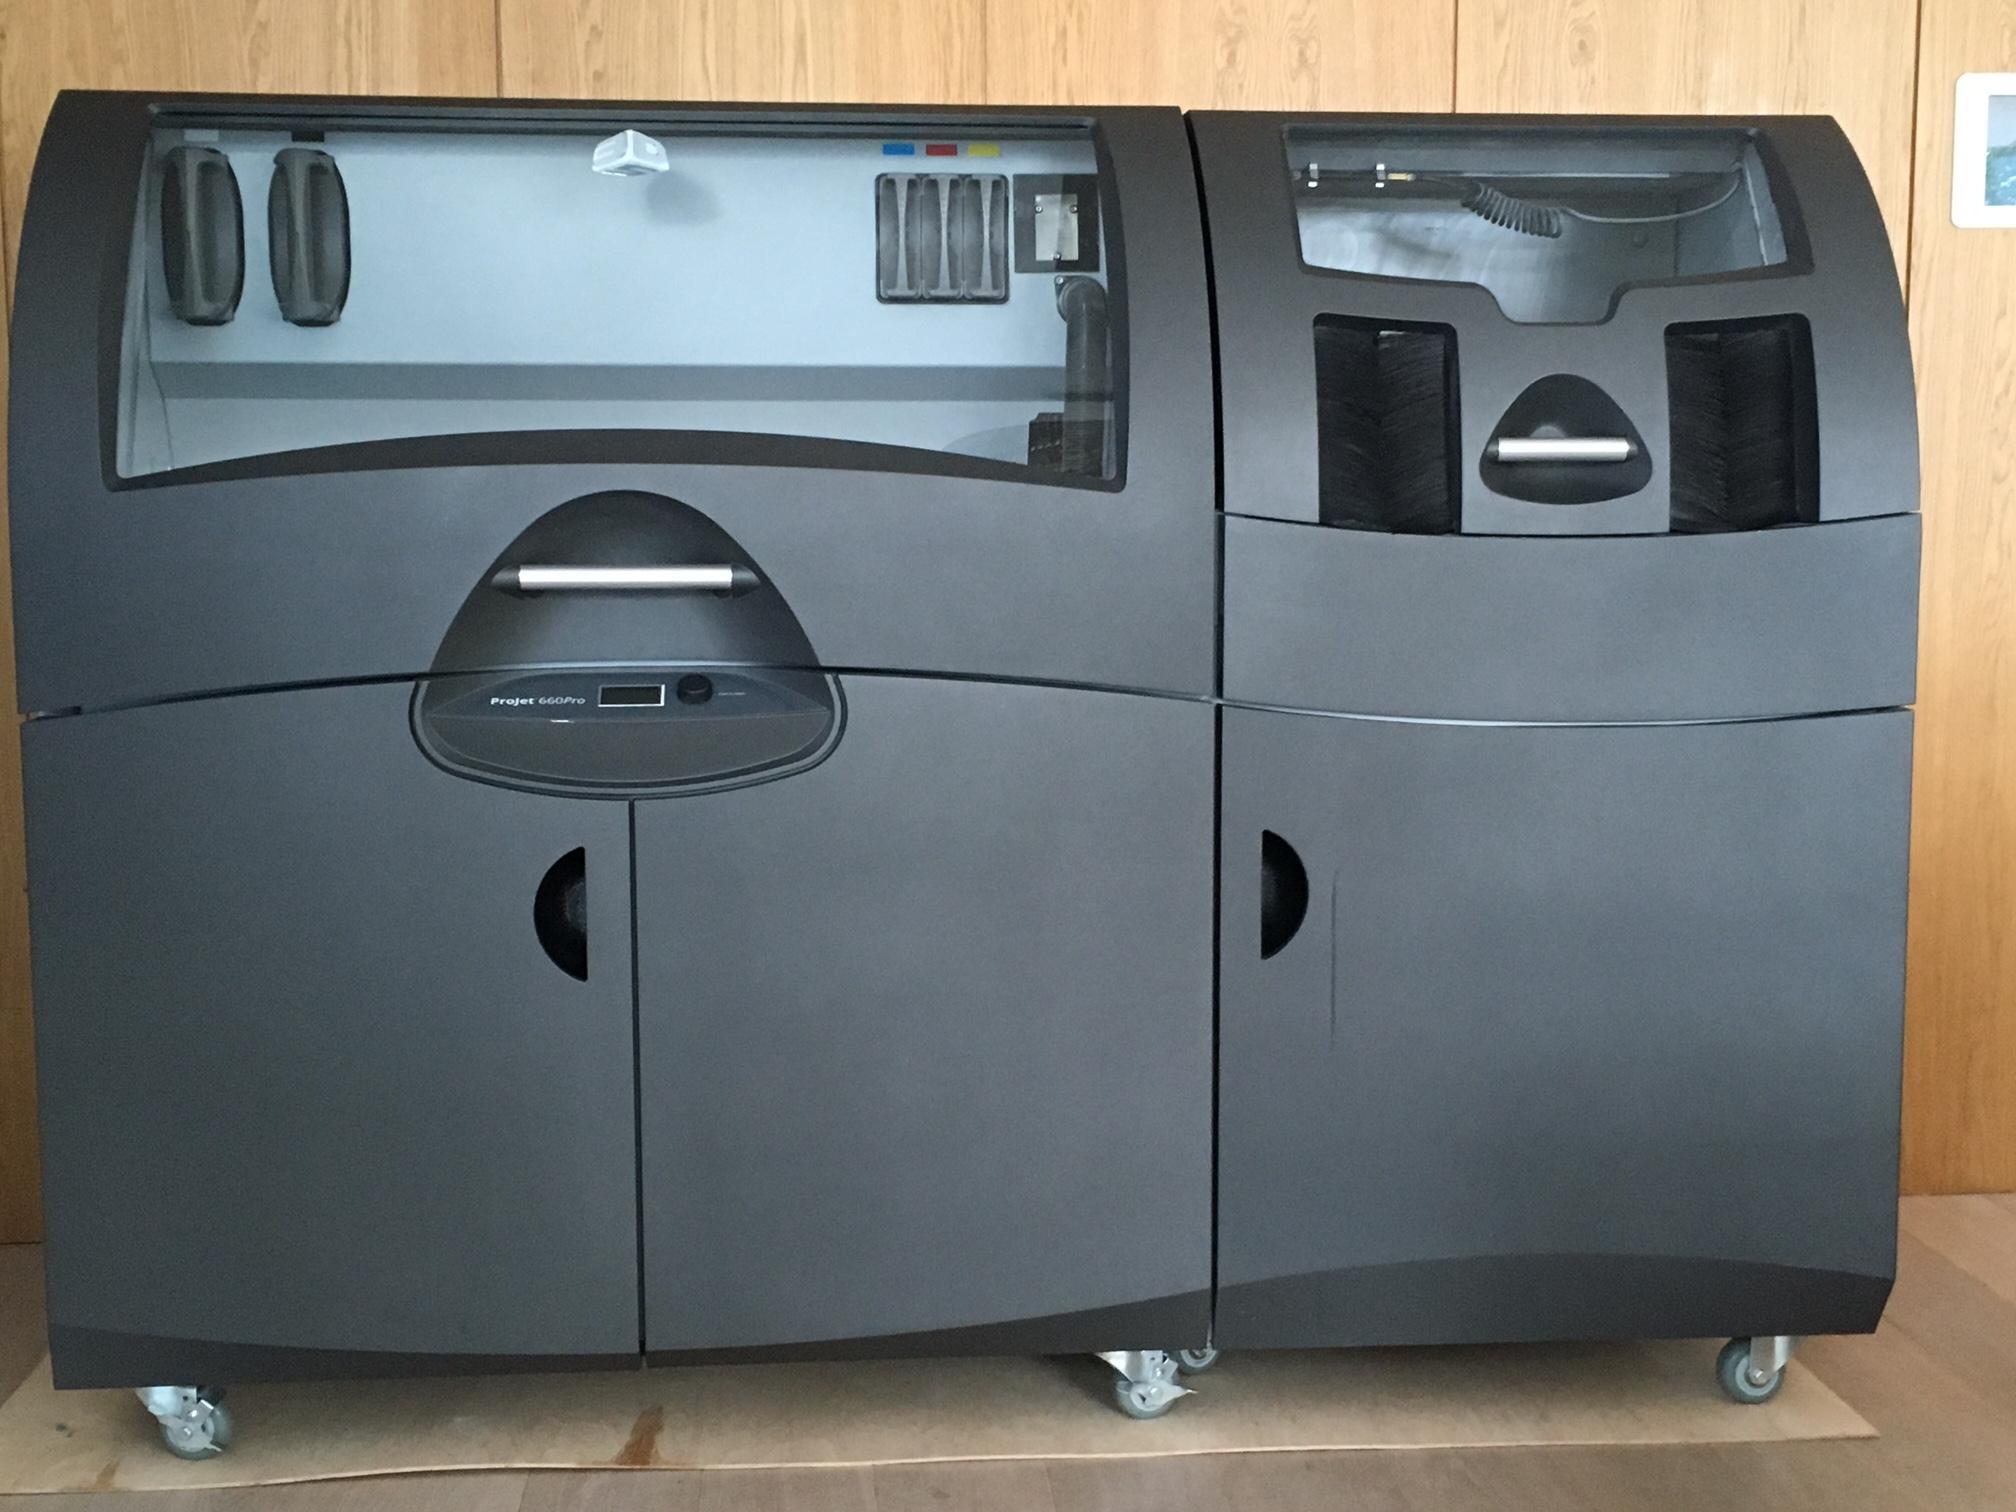 imprimante 3d 3d systems projet 660 pro 3d printer machines d 39 occasion exapro. Black Bedroom Furniture Sets. Home Design Ideas